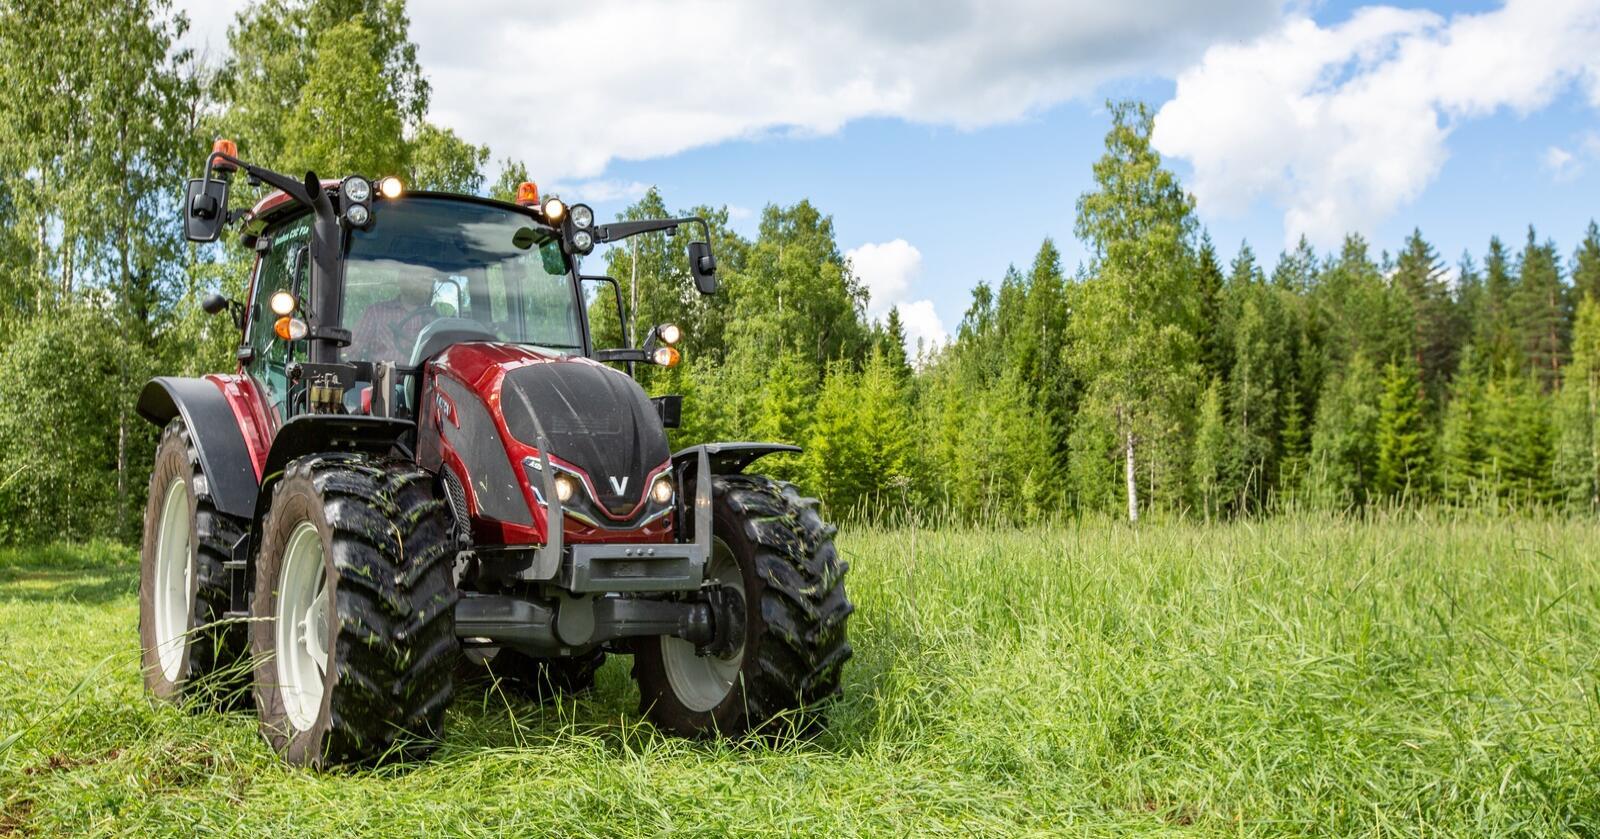 Populær: Valtra A har solgt bra i Norge, og egner seg til en rekke oppgaver.